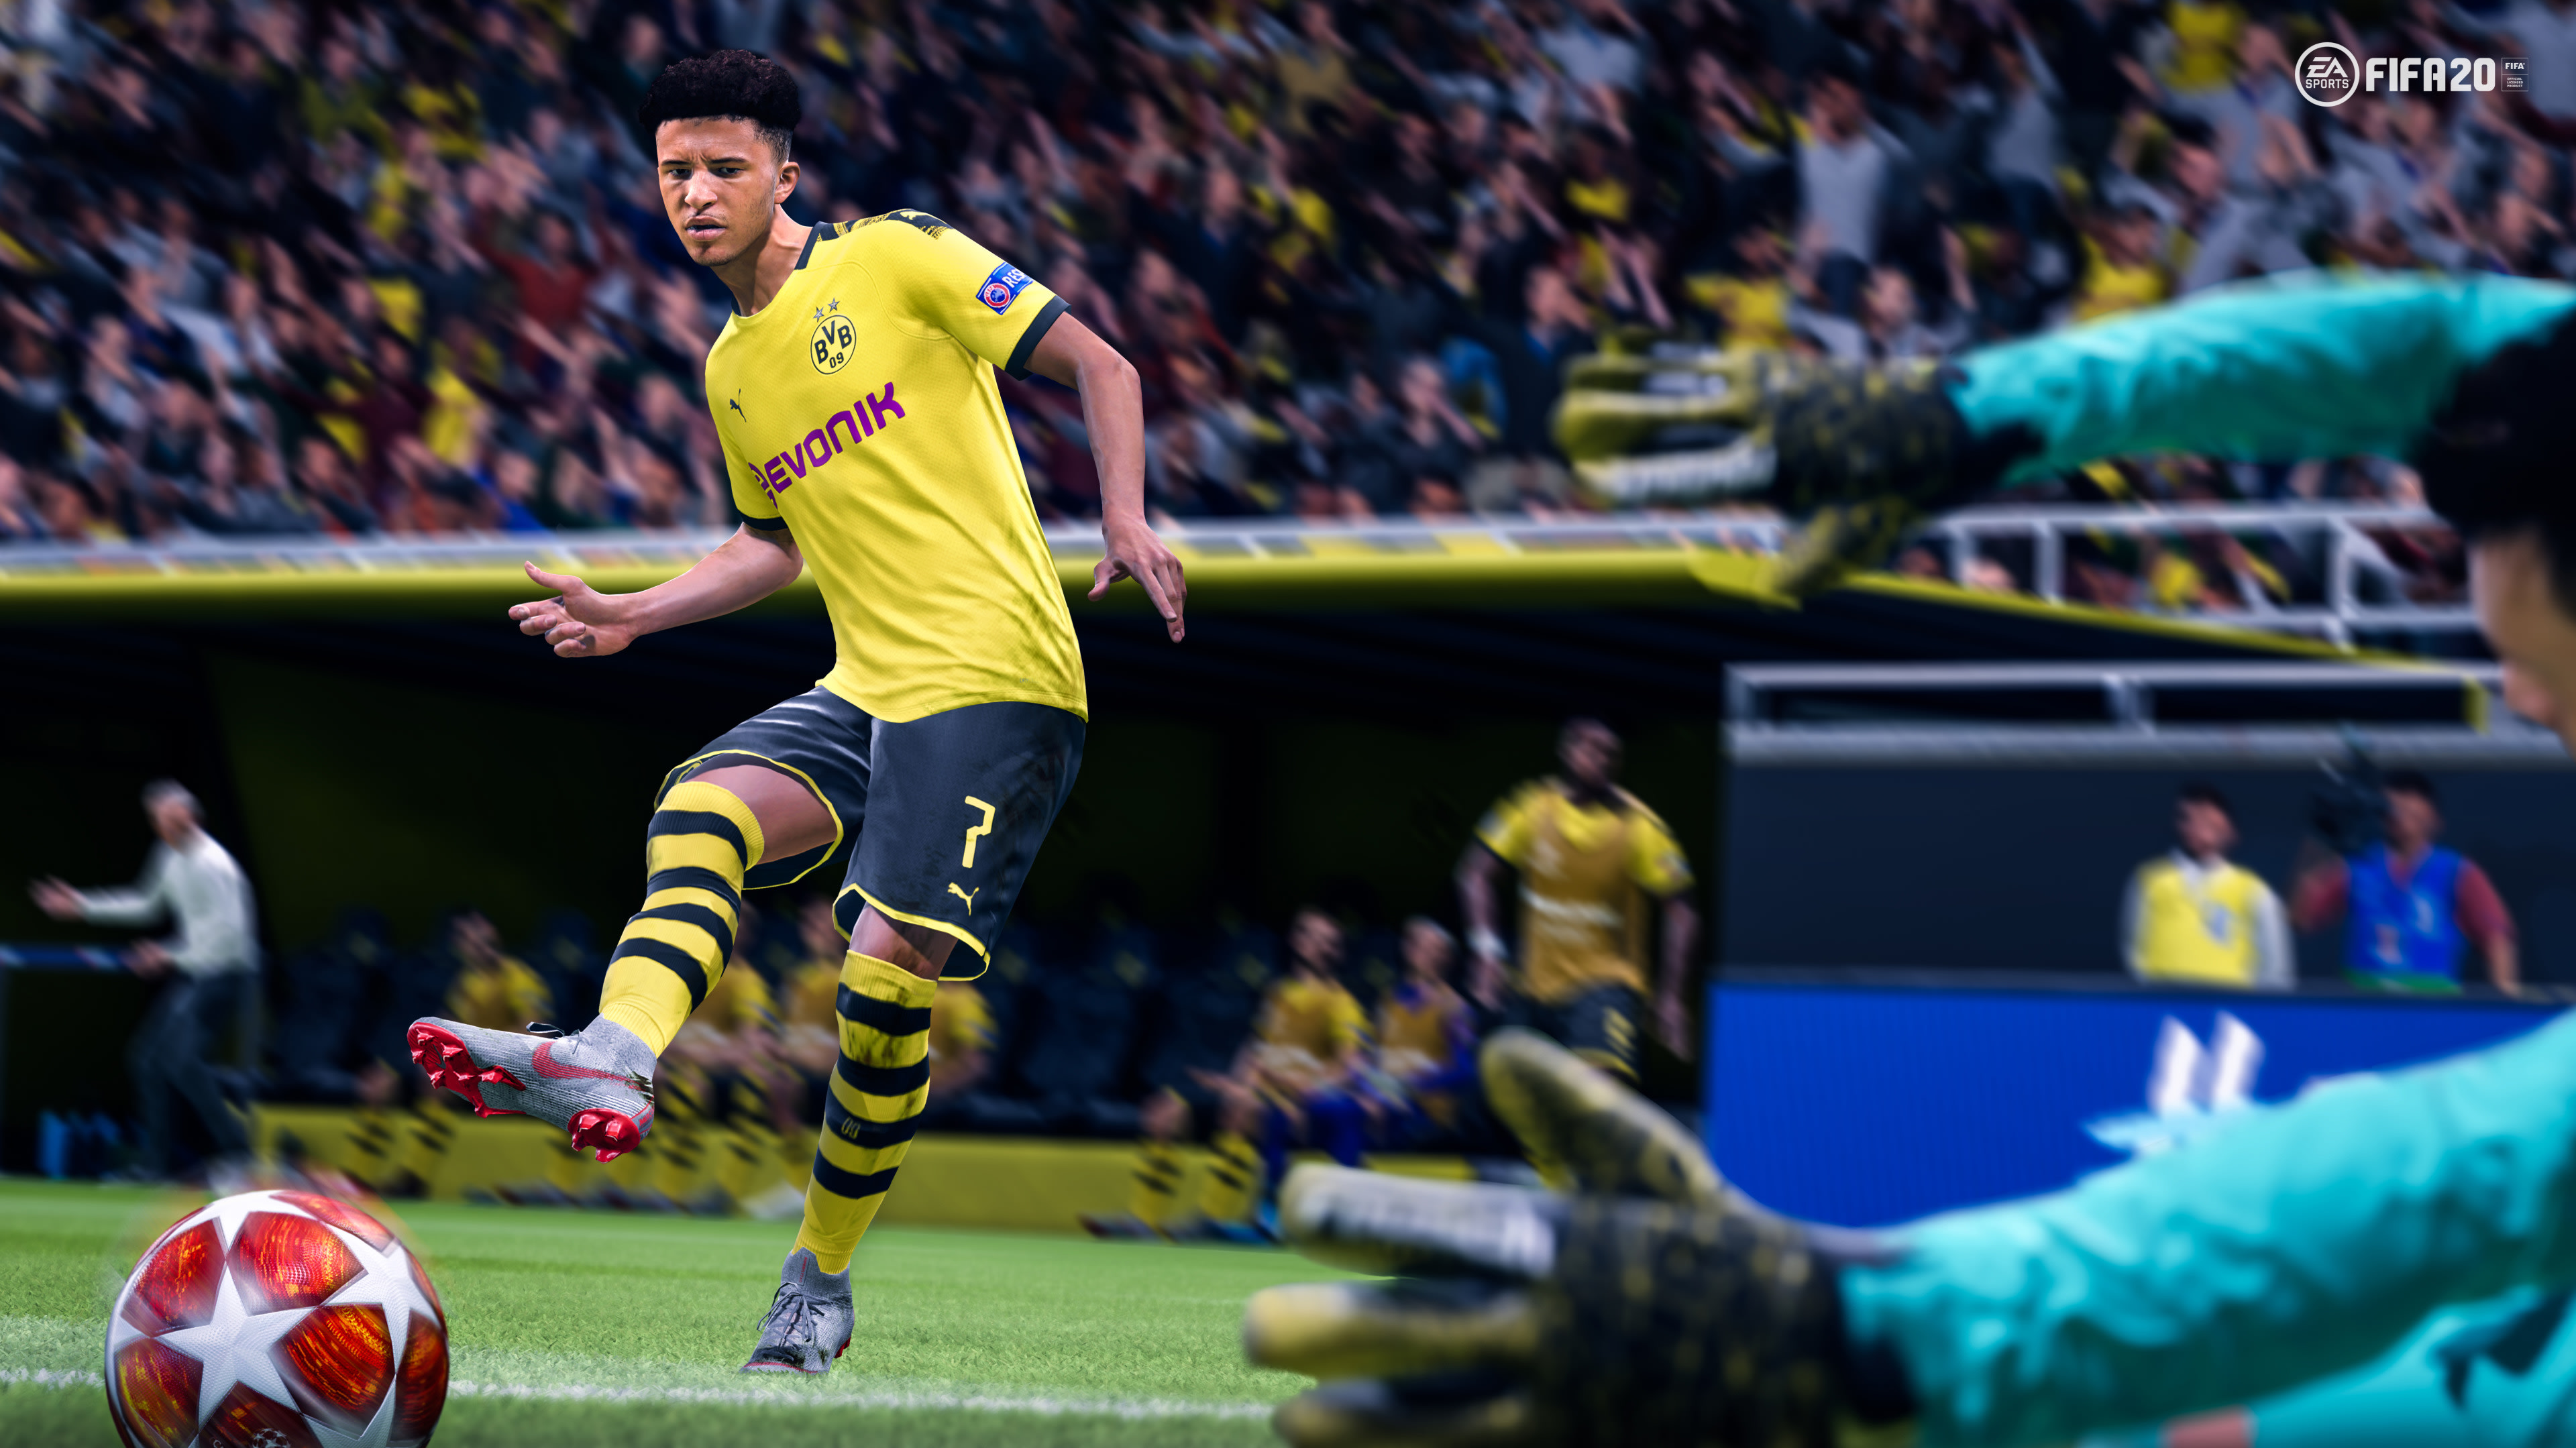 FIFA 20 HD Wallpaper   Background Image